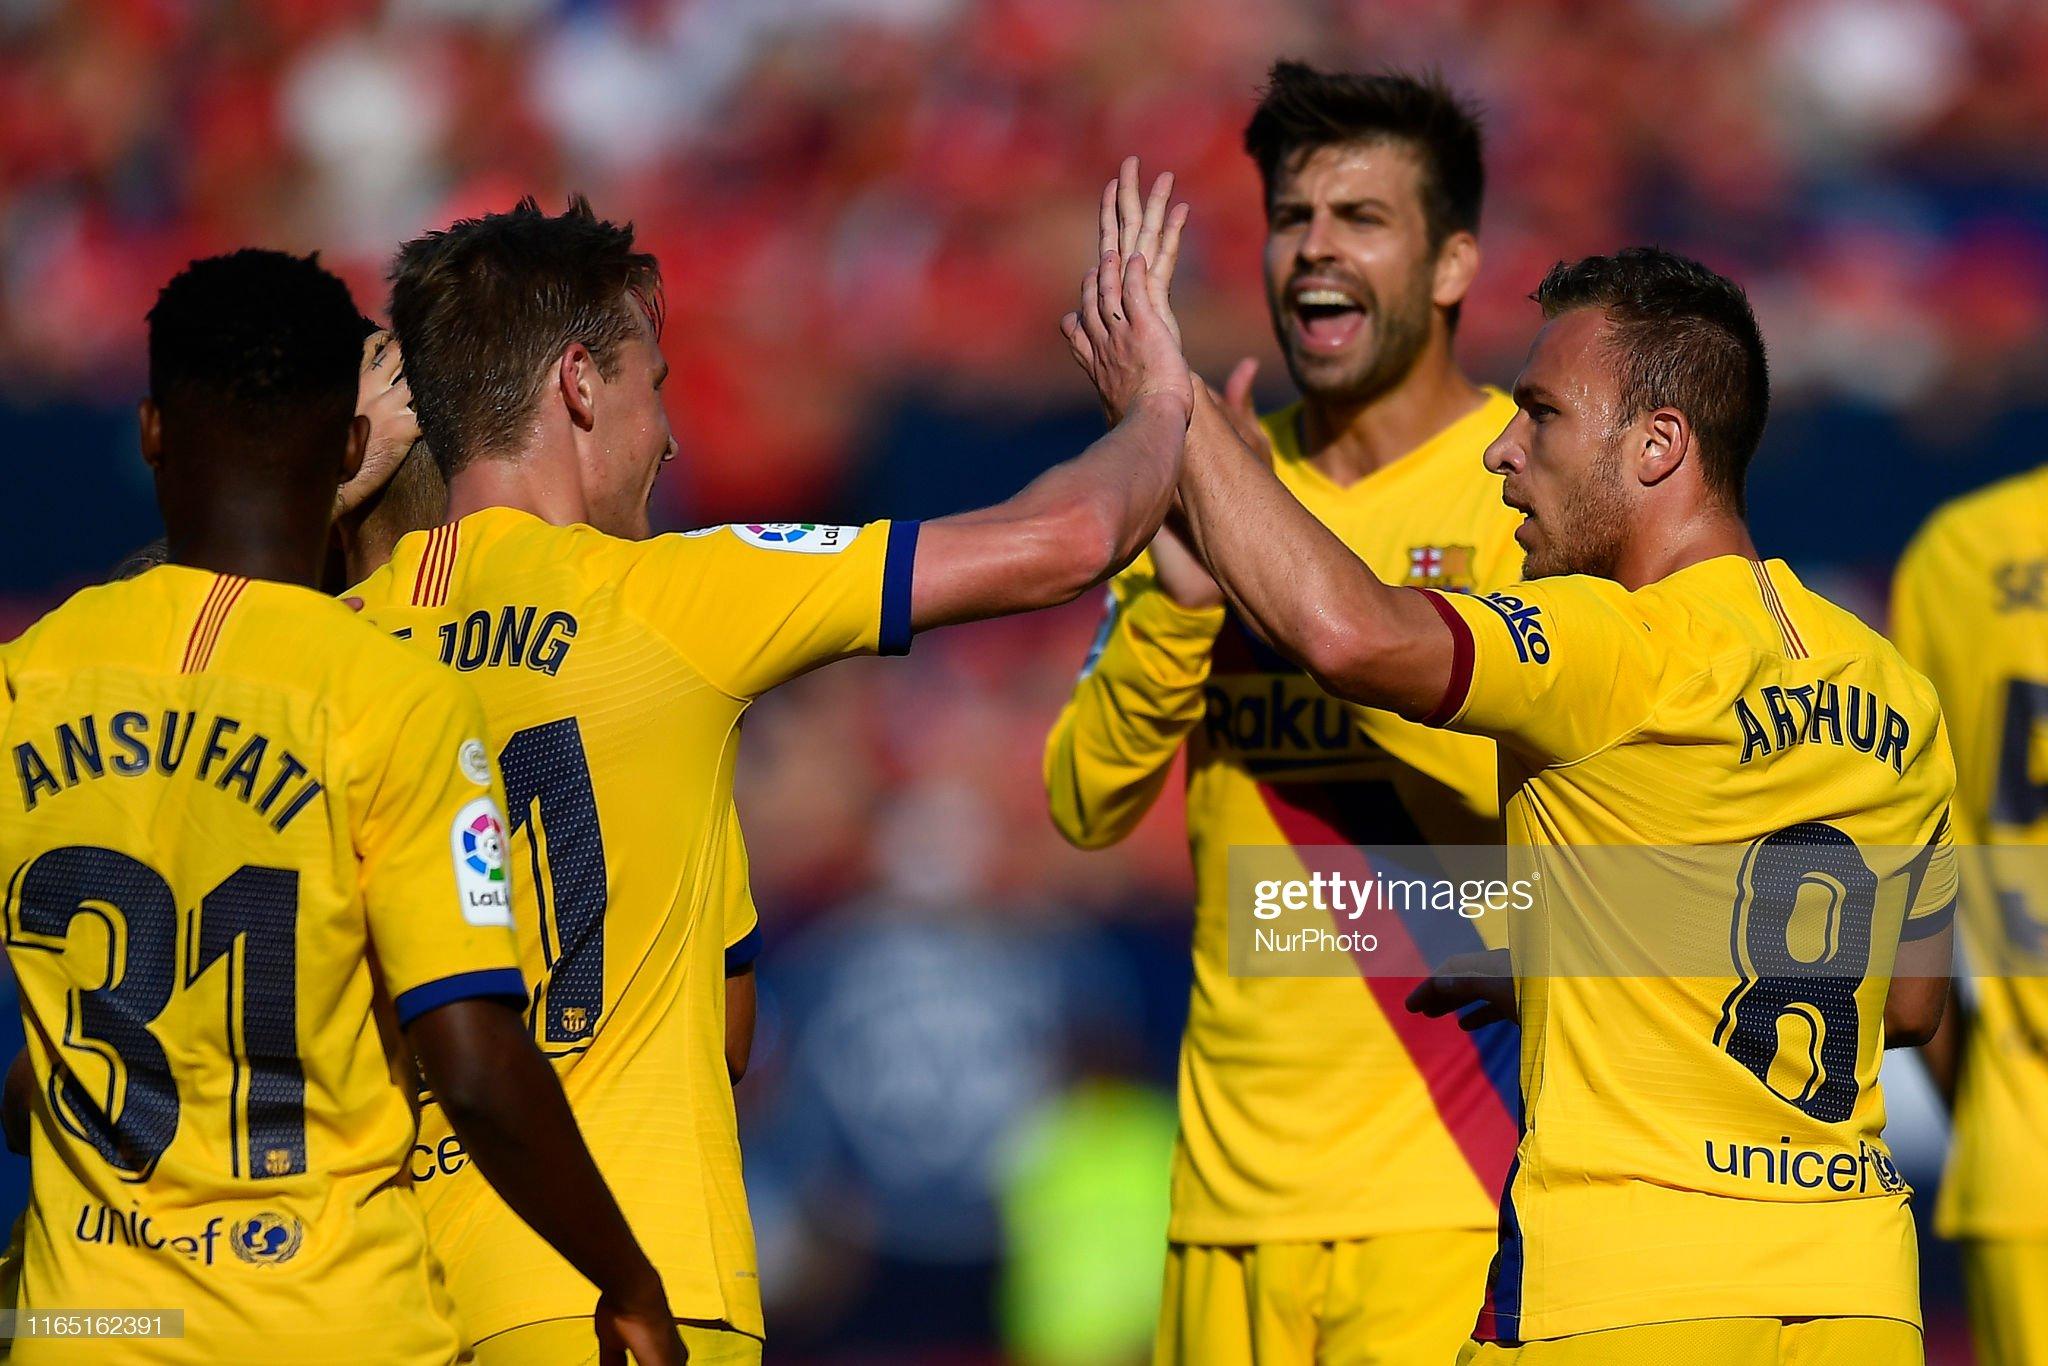 صور مباراة : أوساسونا - برشلونة 2-2 ( 31-08-2019 )  Arthur-melo-of-barcelona-celebrates-after-scoring-his-sides-first-picture-id1165162391?s=2048x2048